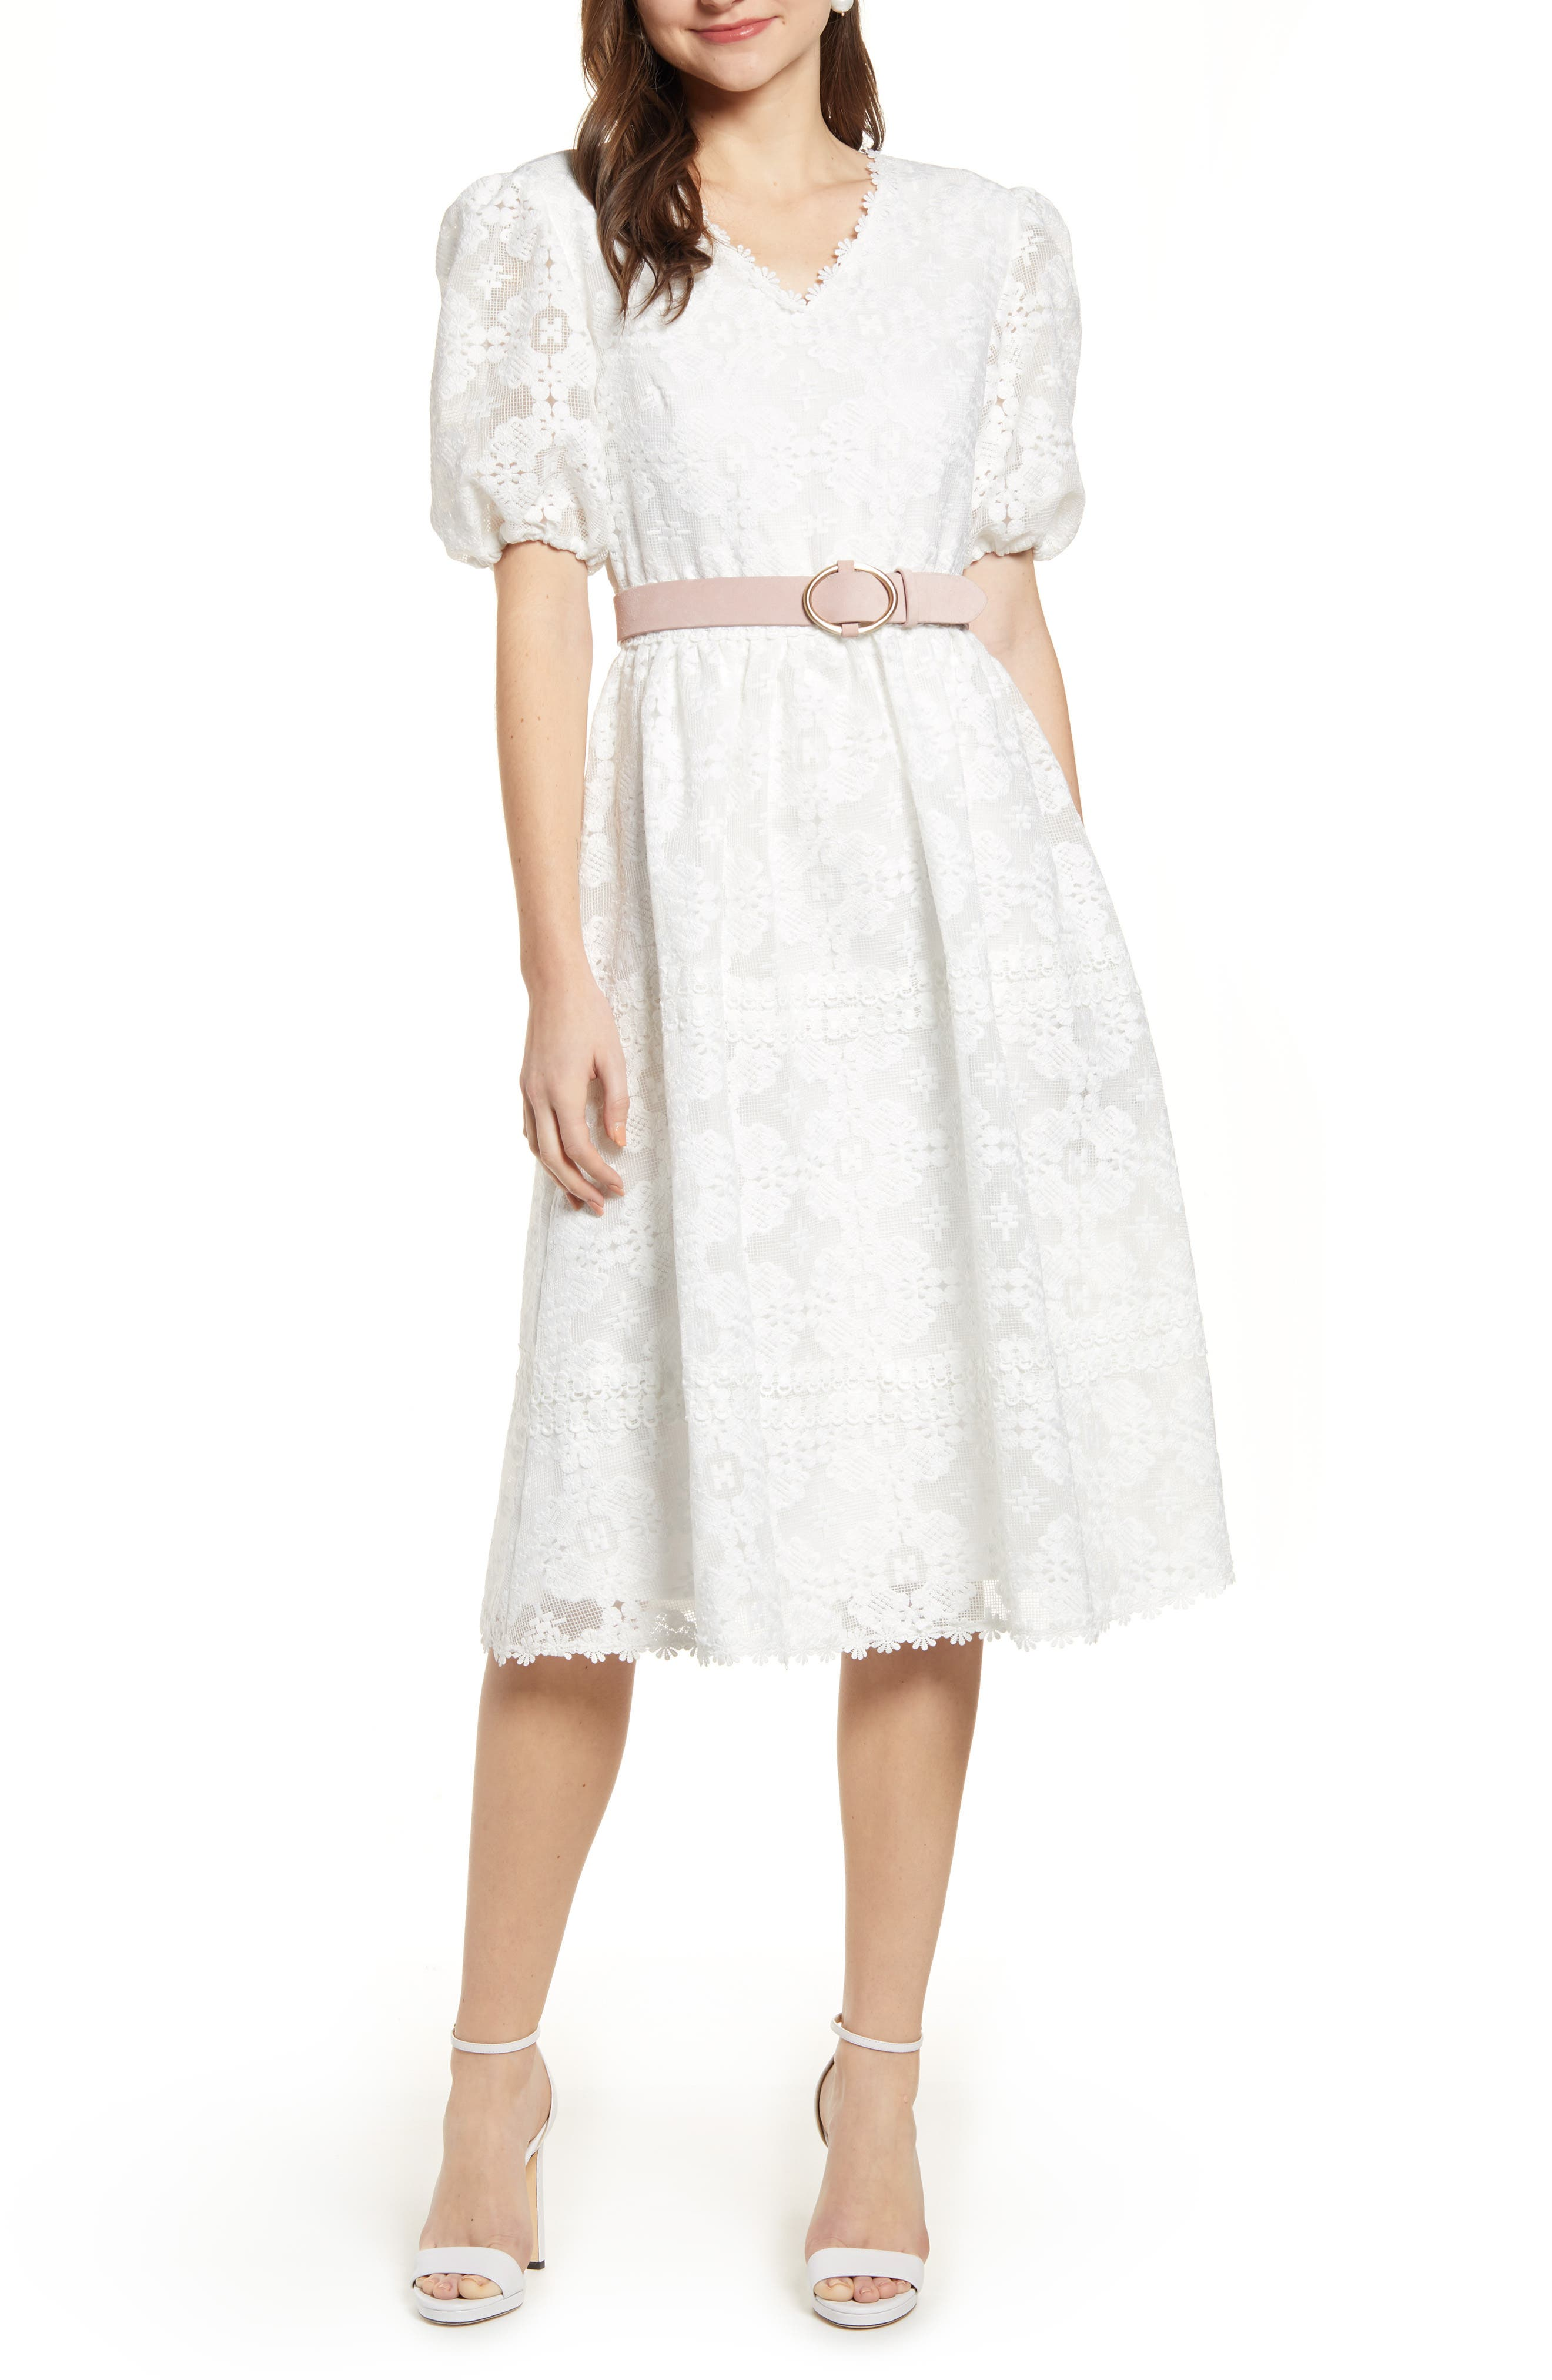 Rachel Parcell V-Neck Lace Dress, White (Nordstrom Exclusive)